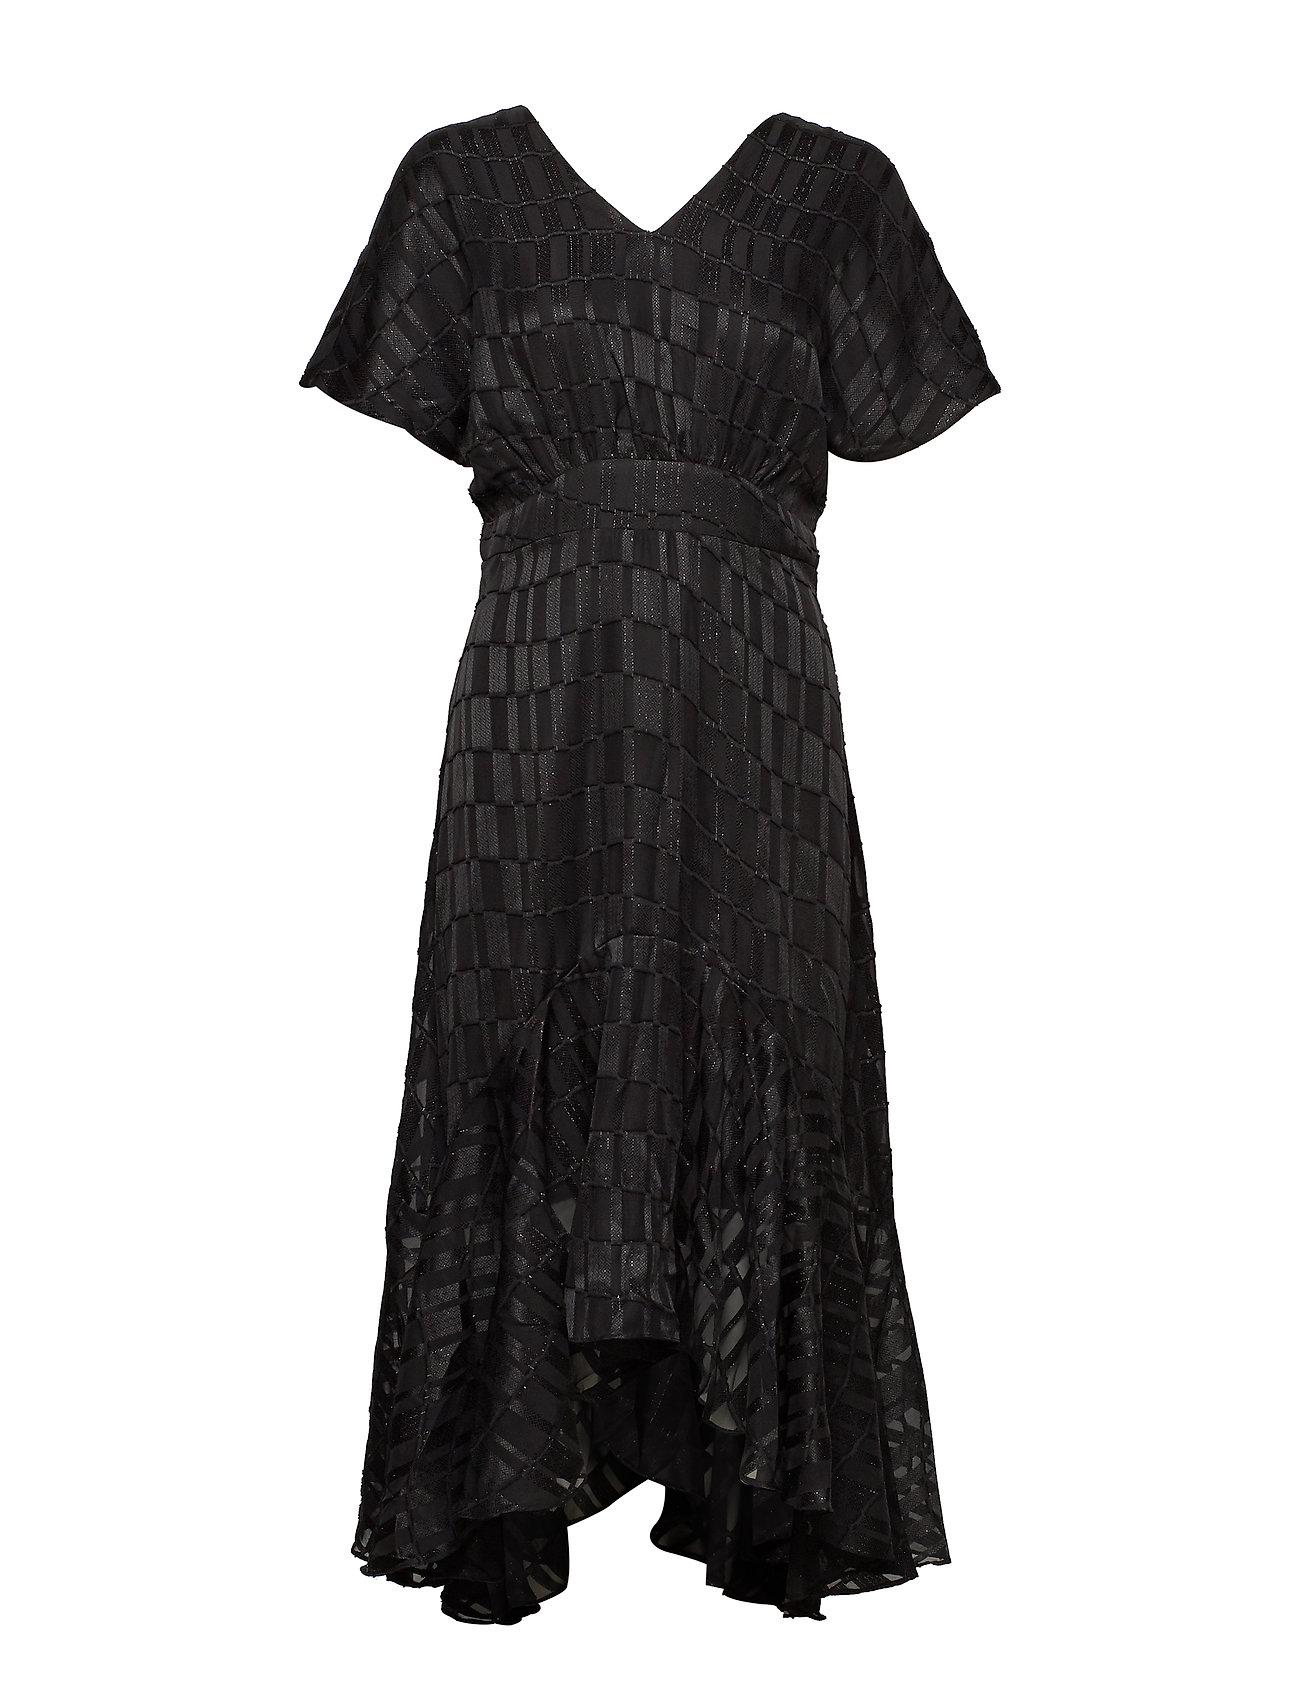 Minus Thora dress - SORT